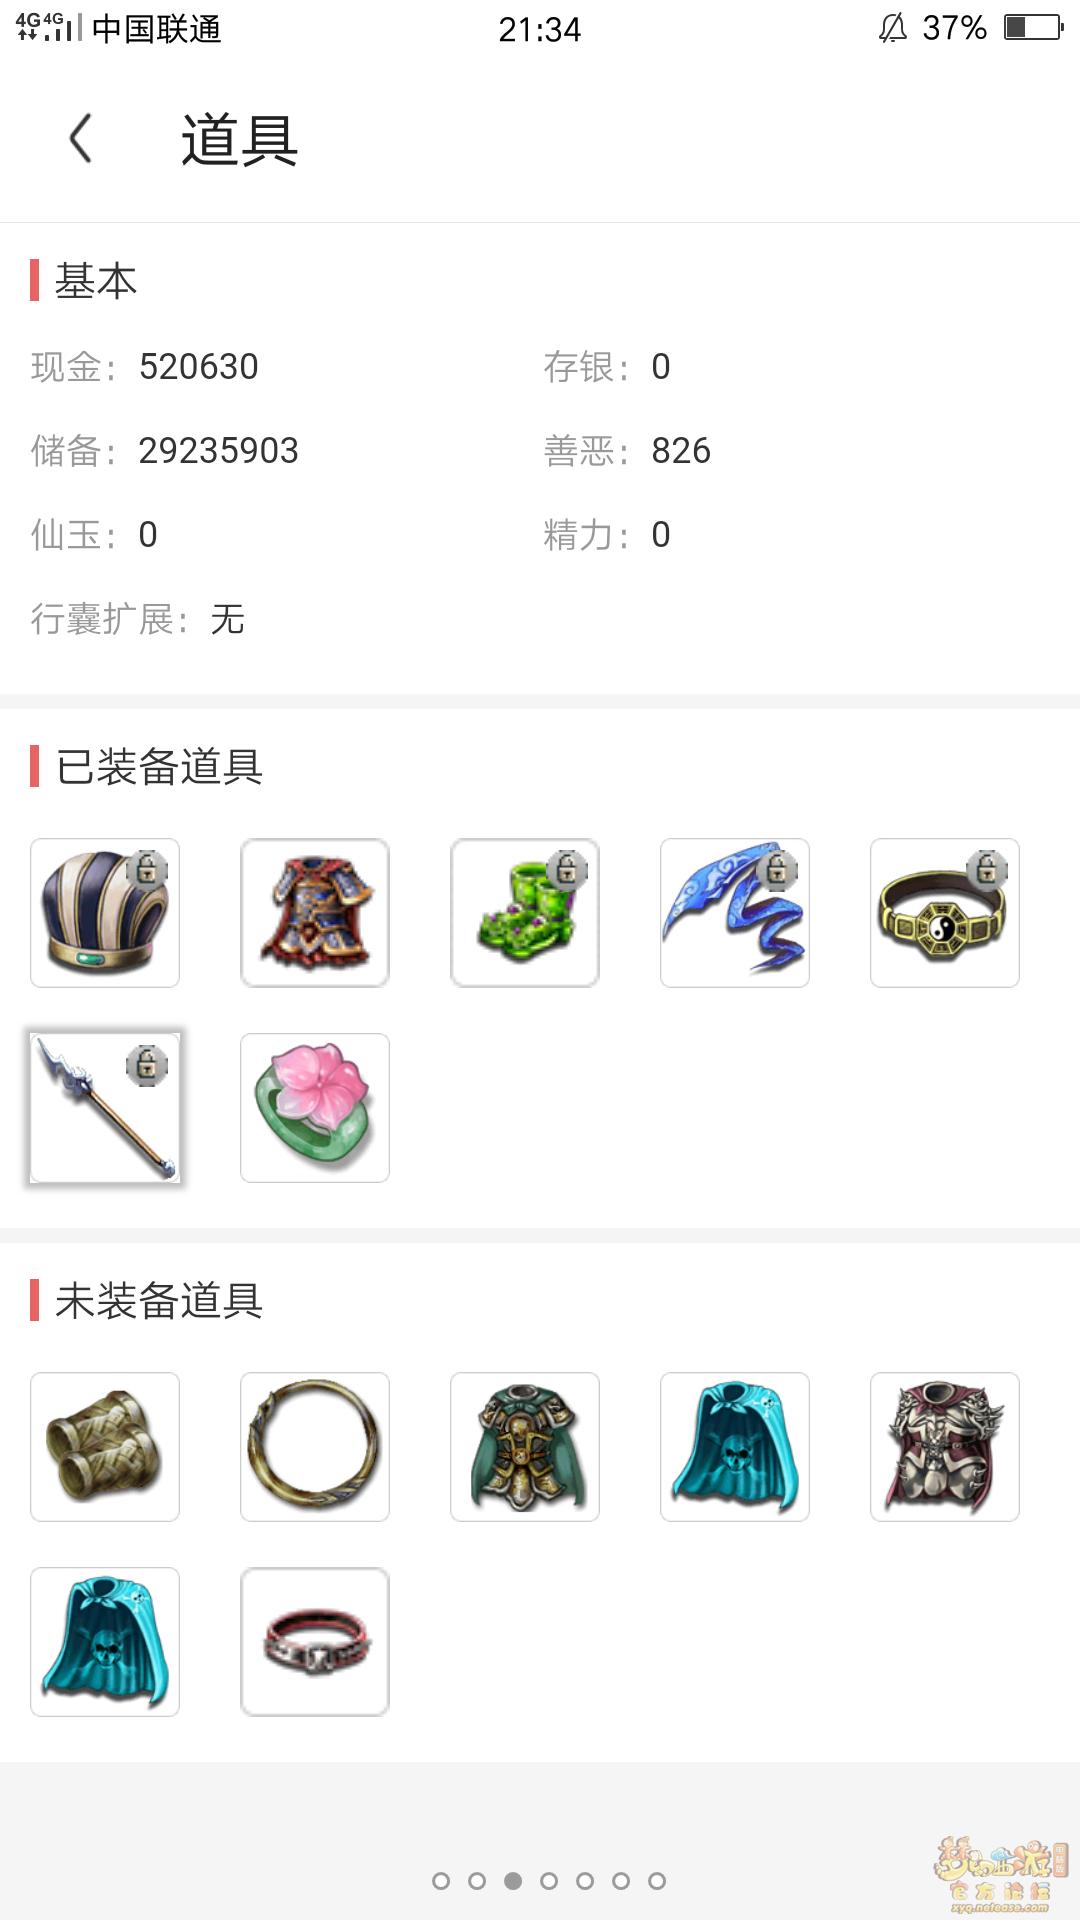 Screenshot_2020-01-20-21-34-38-04.png